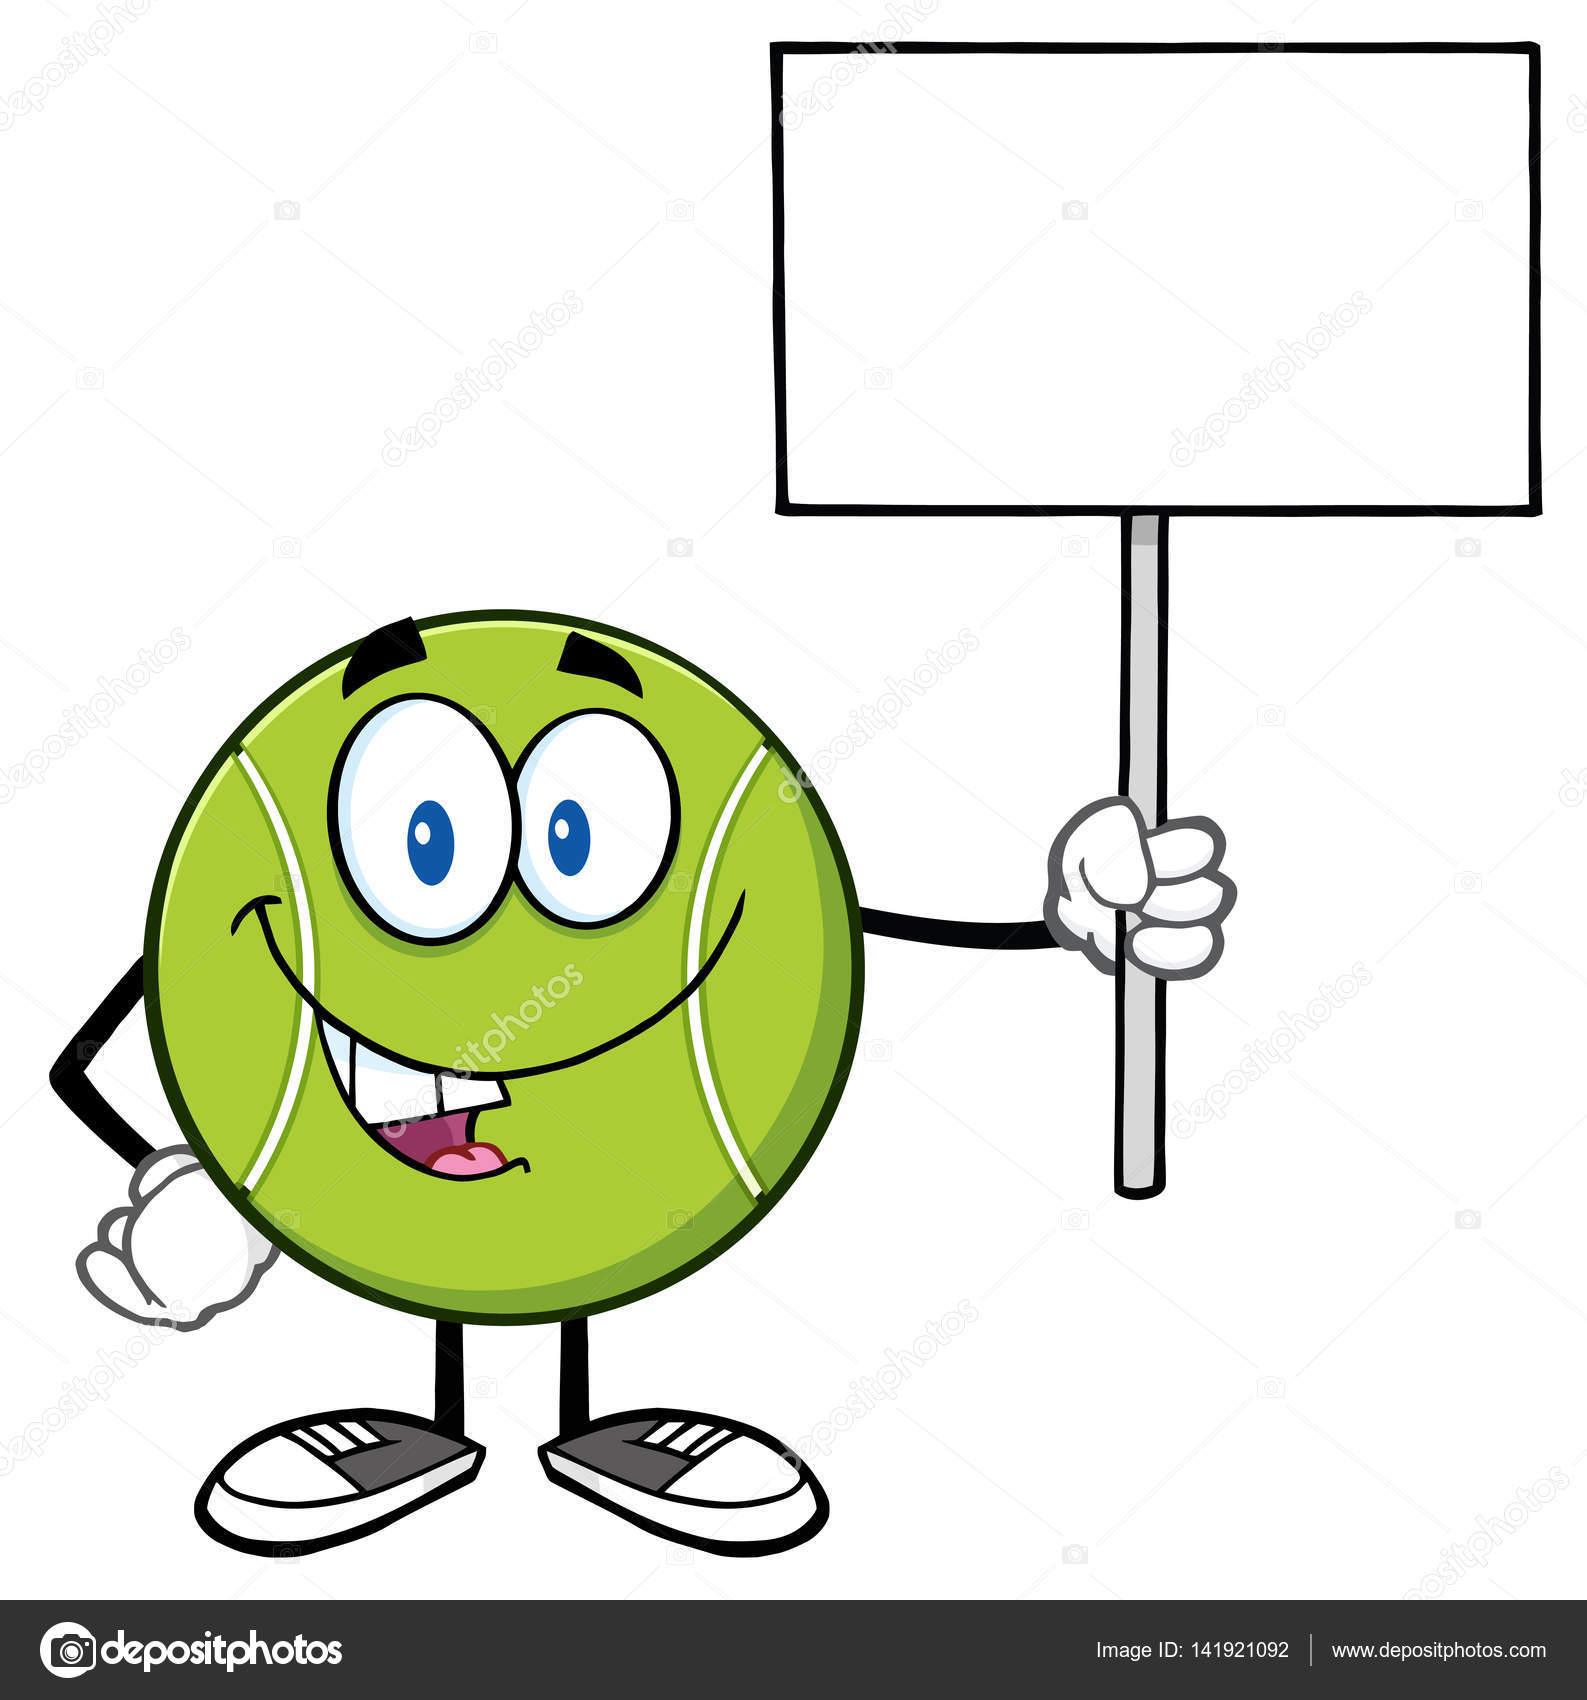 Tenis pelota stock de ilustracion ilustracion libre de stock de - Mascota De Dibujos Animados De Bola De Tenis Vector De Stock 141921092